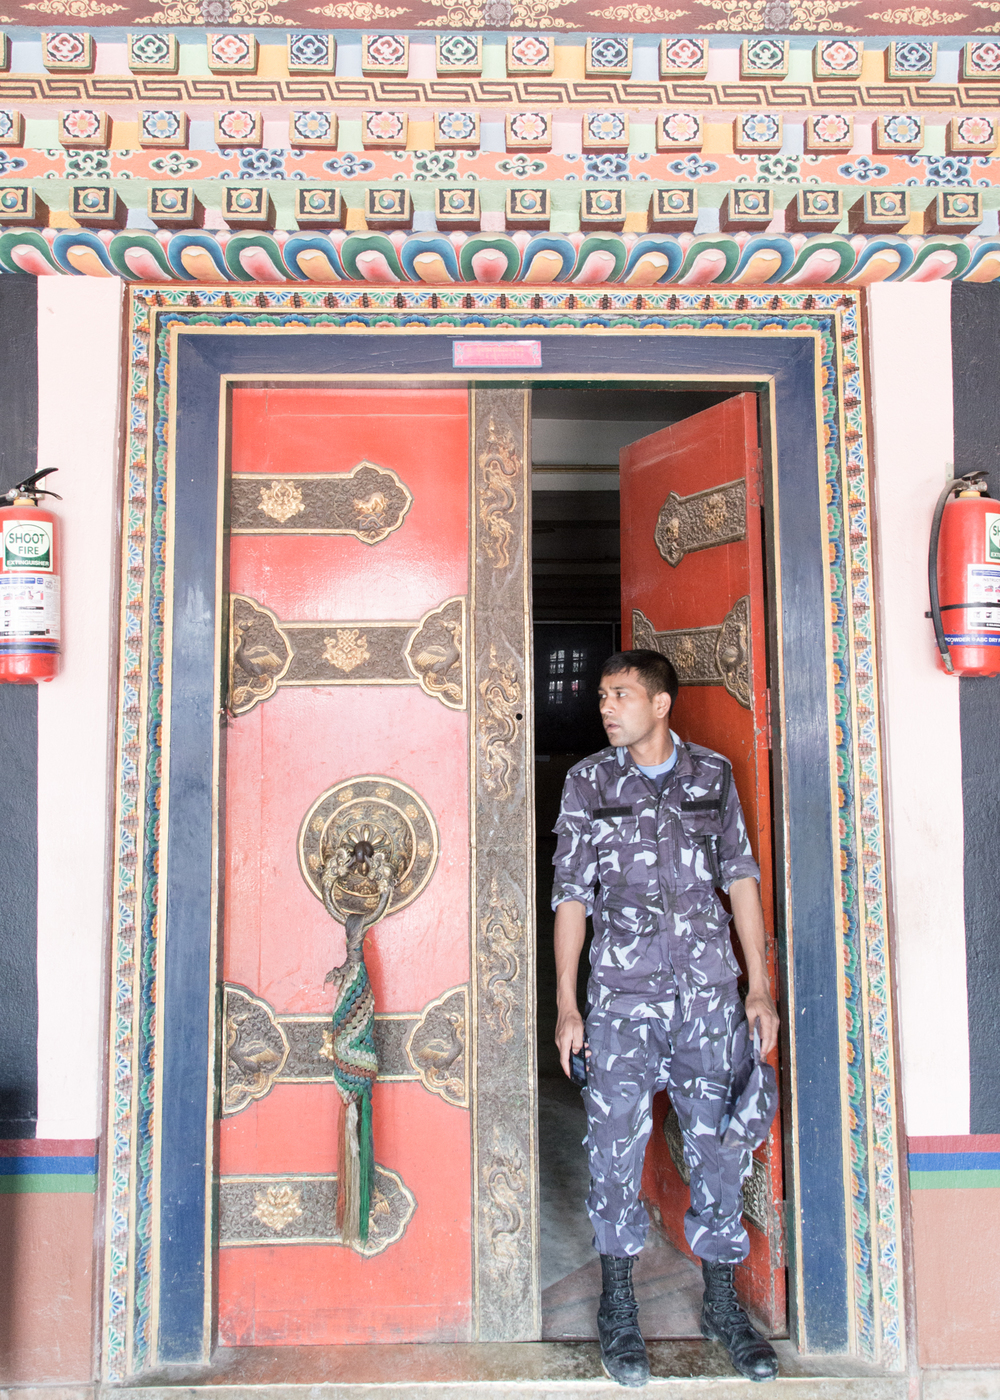 Policed - Boudha, 2015